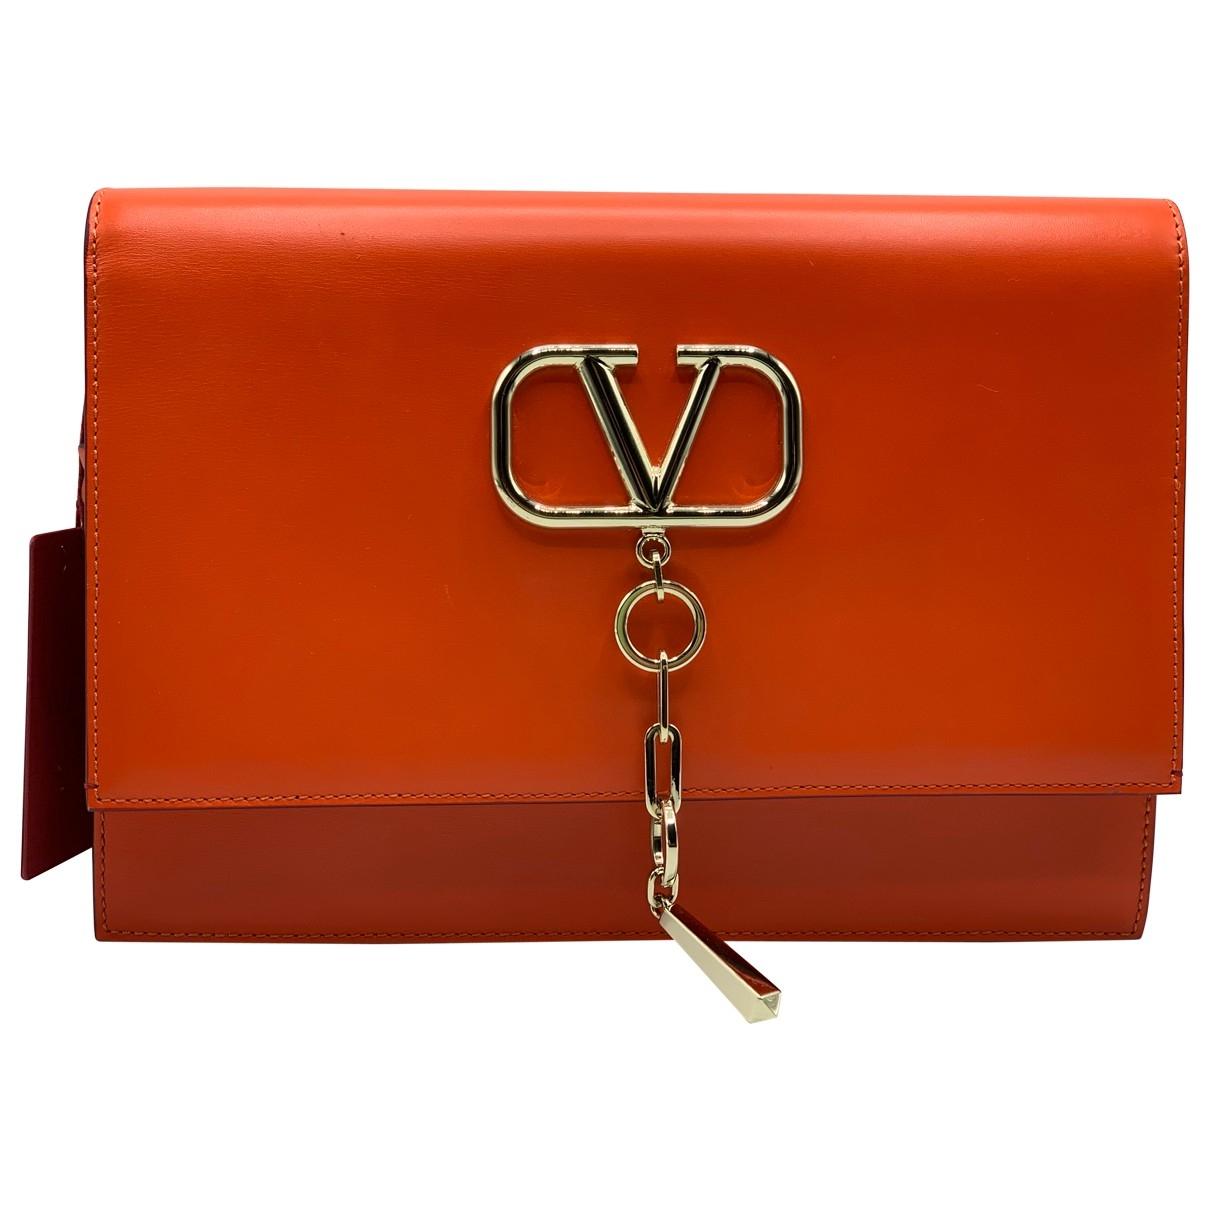 Valentino Garavani - Sac a main Vring pour femme en cuir - orange